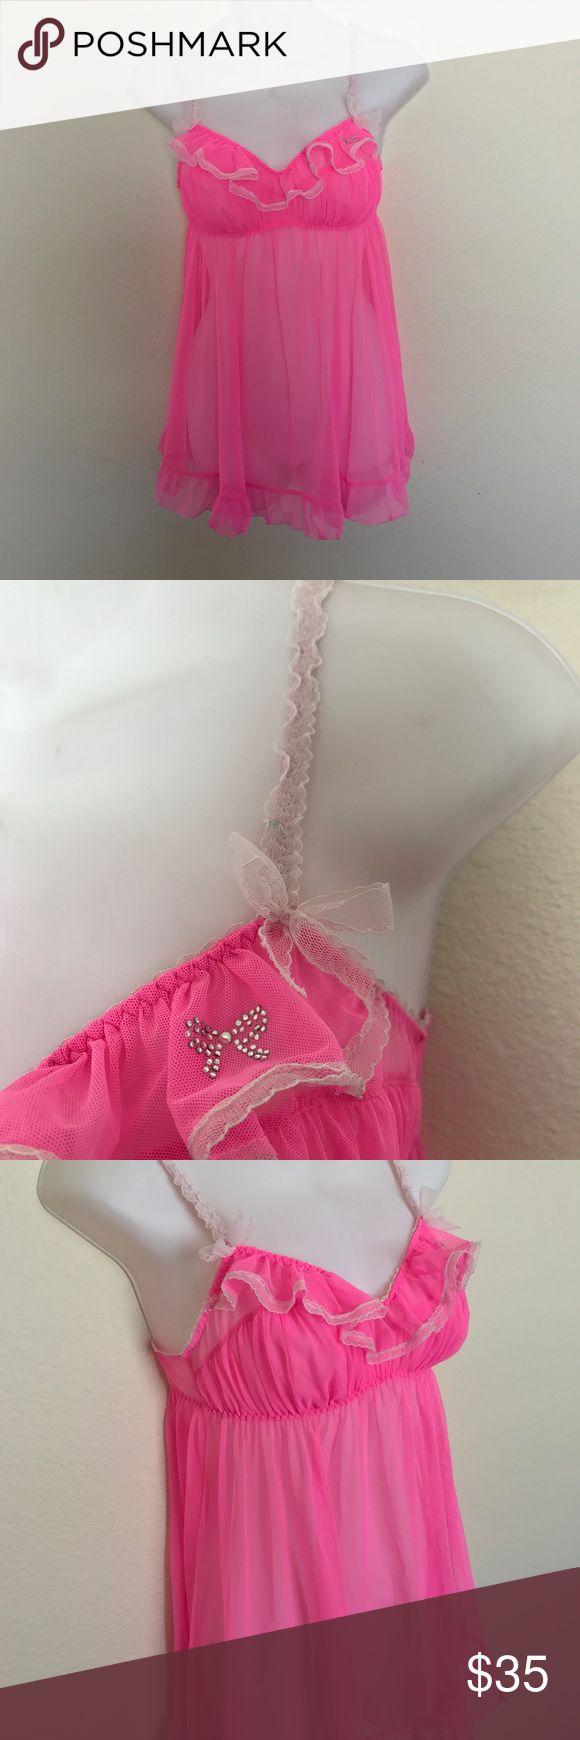 Victoria Secret Woman teddy babydoll SZ M Pink Victoria Secret Woman teddy babydoll SZ M Pink Victoria's Secret Intimates & Sleepwear